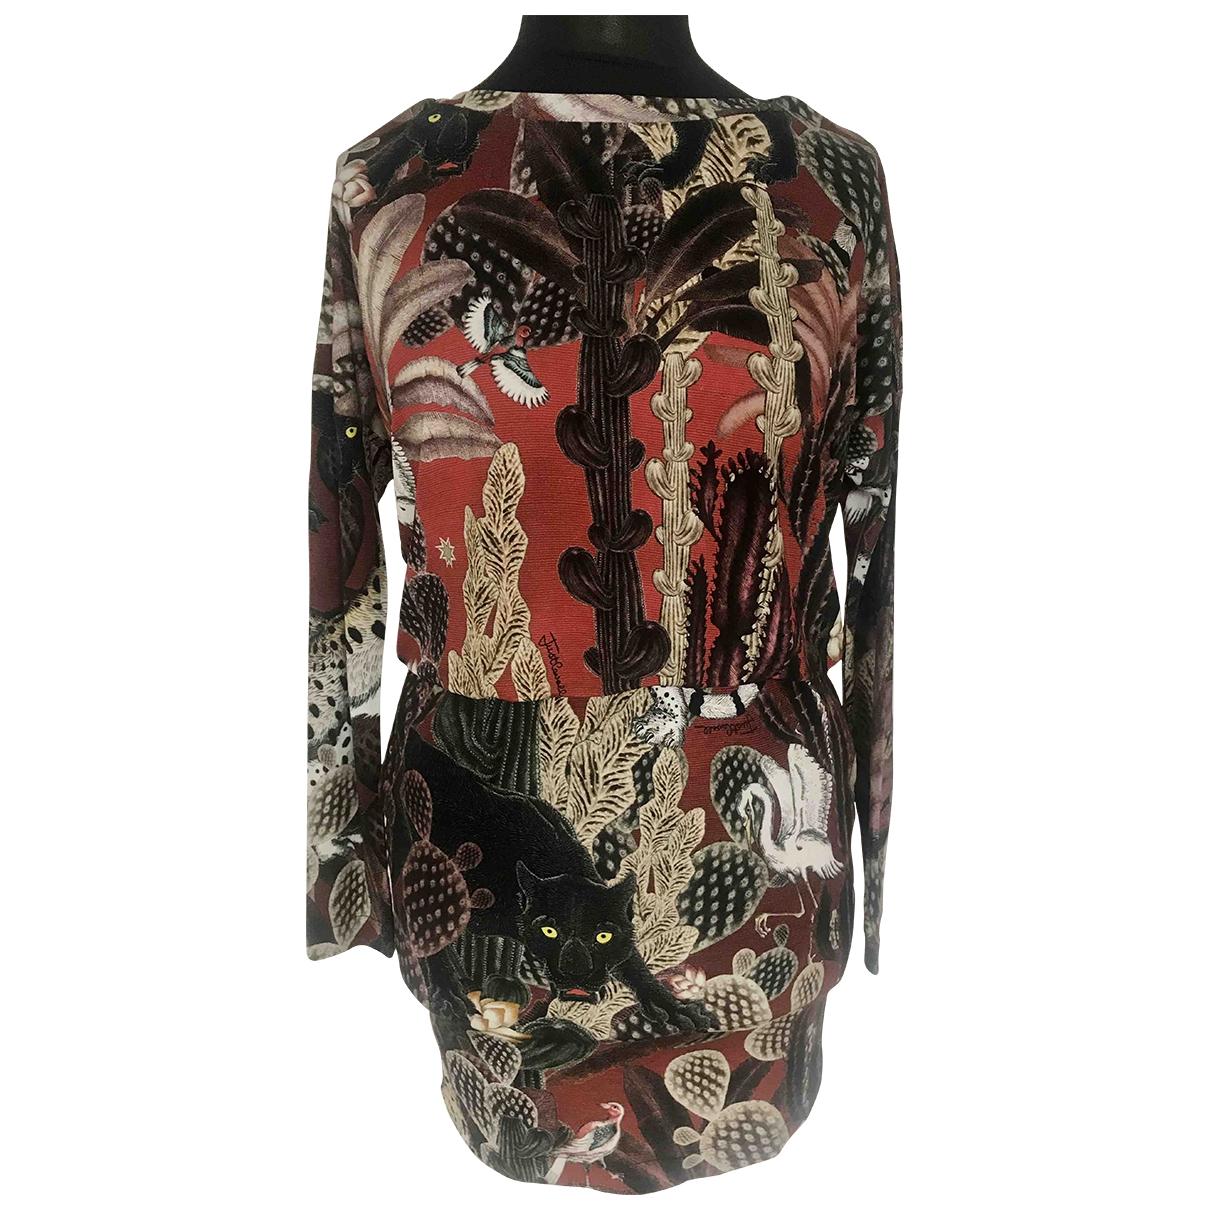 Just Cavalli \N Multicolour dress for Women 40 IT